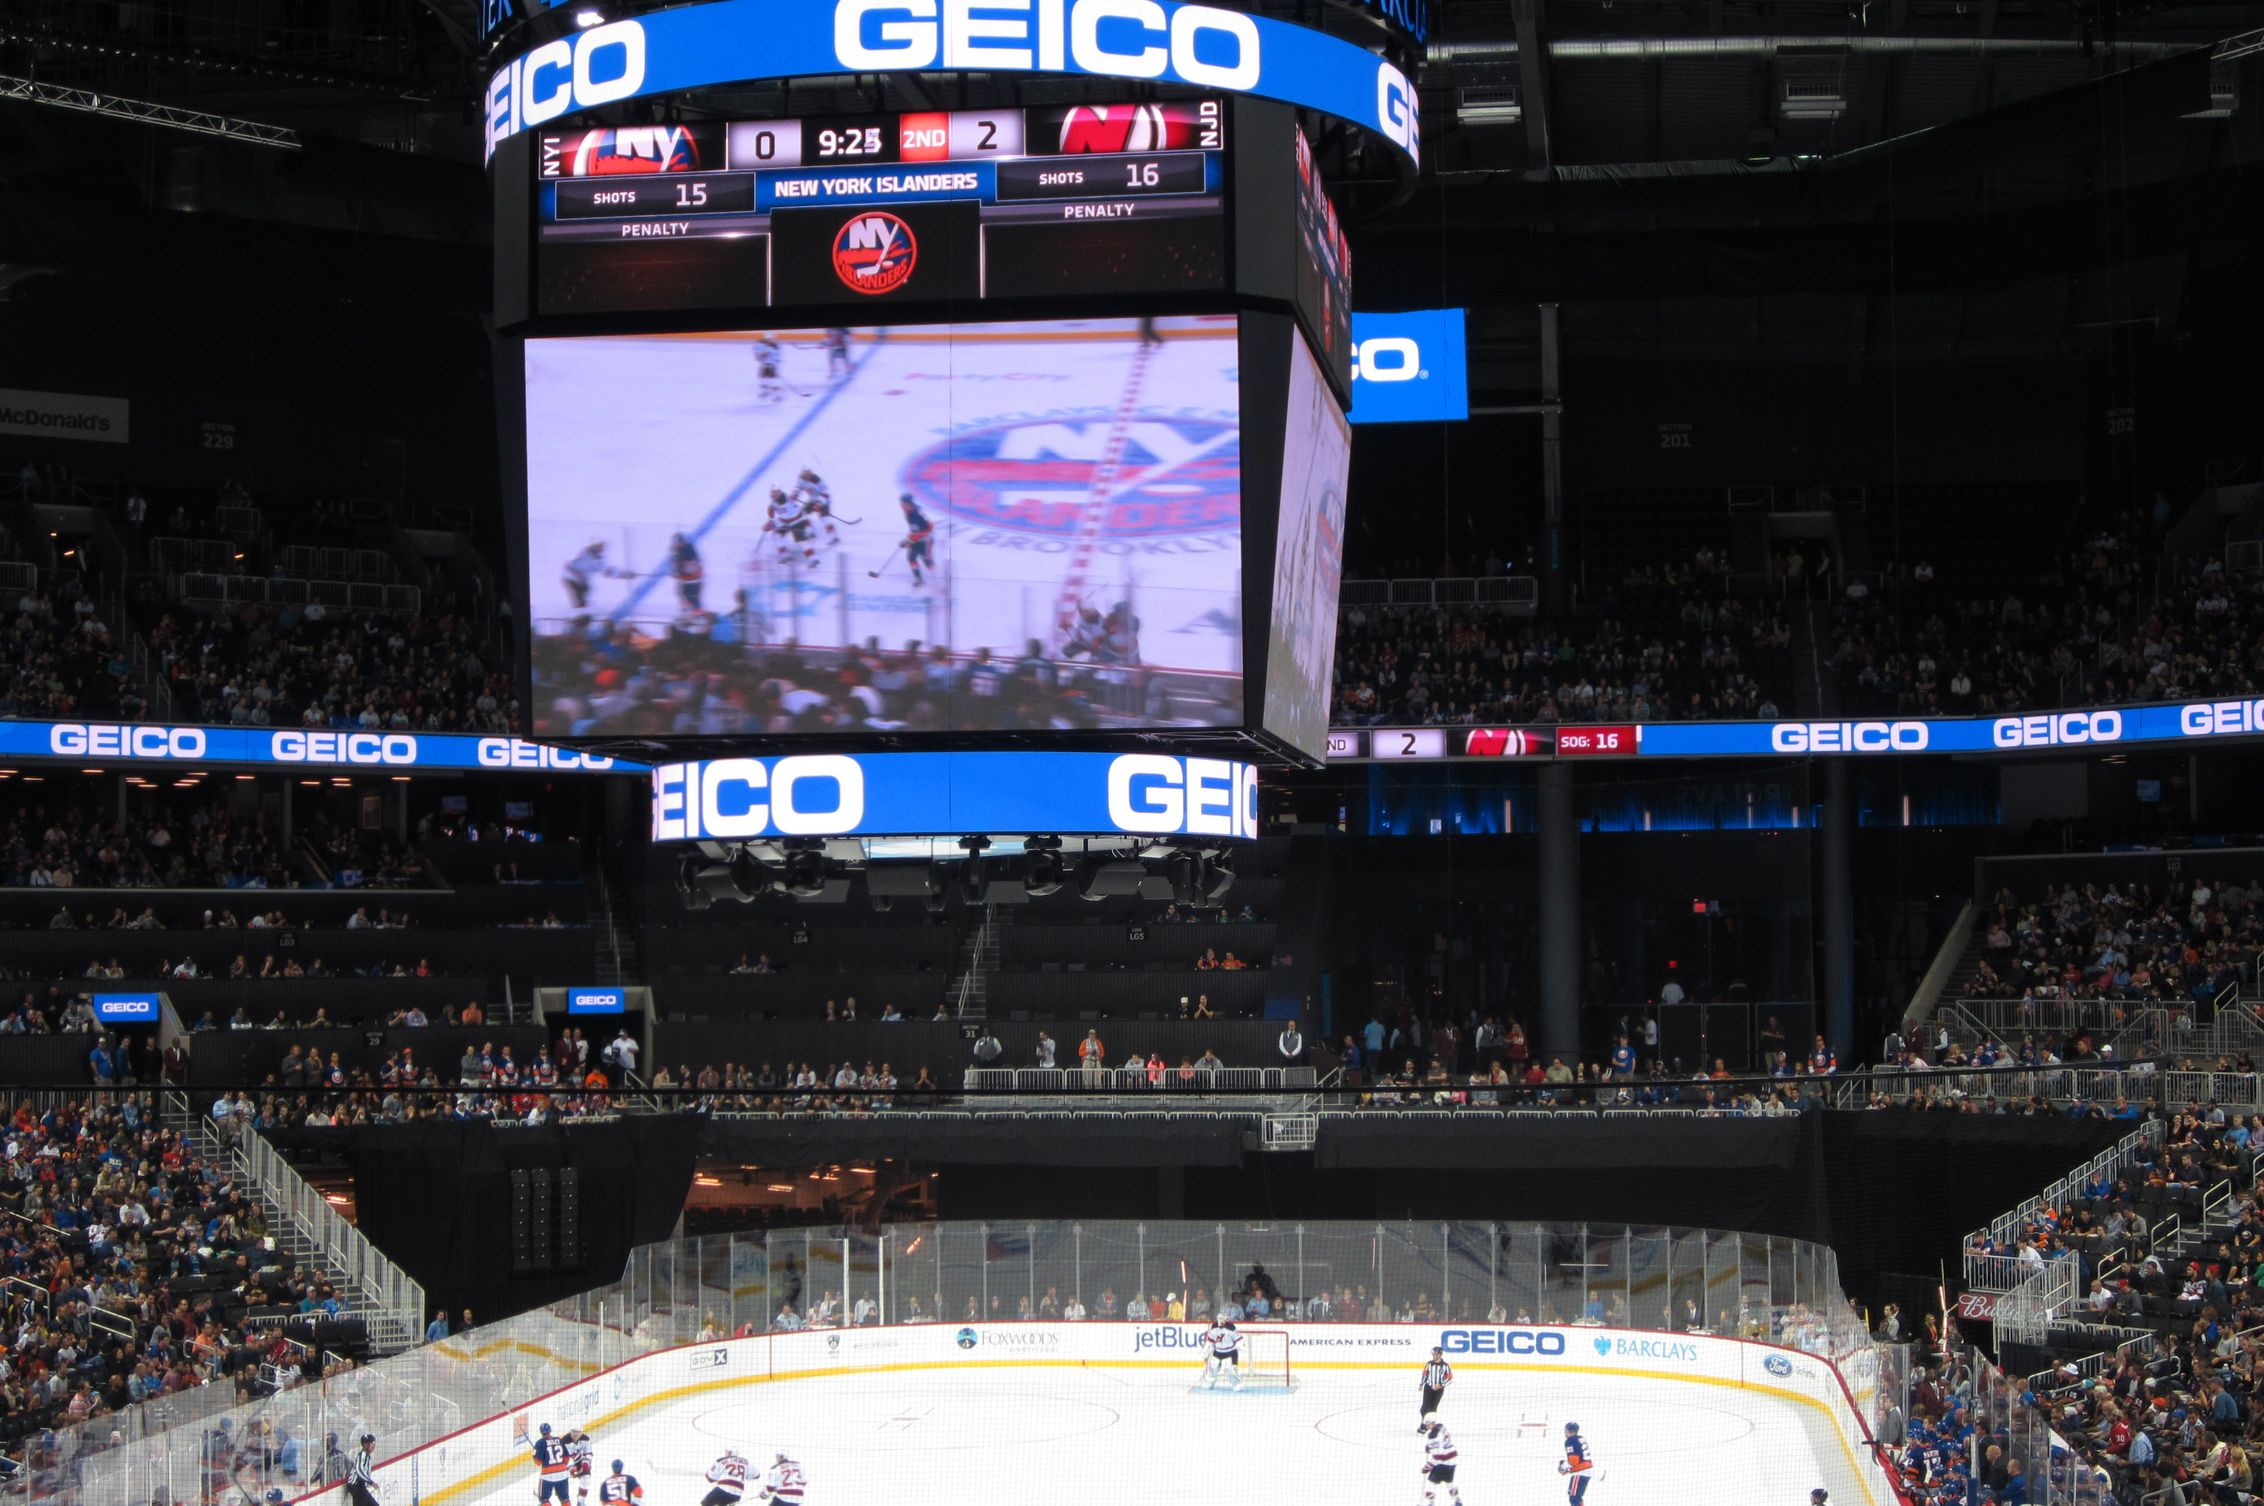 23-islanders-hockey-barclays-center-3.w1